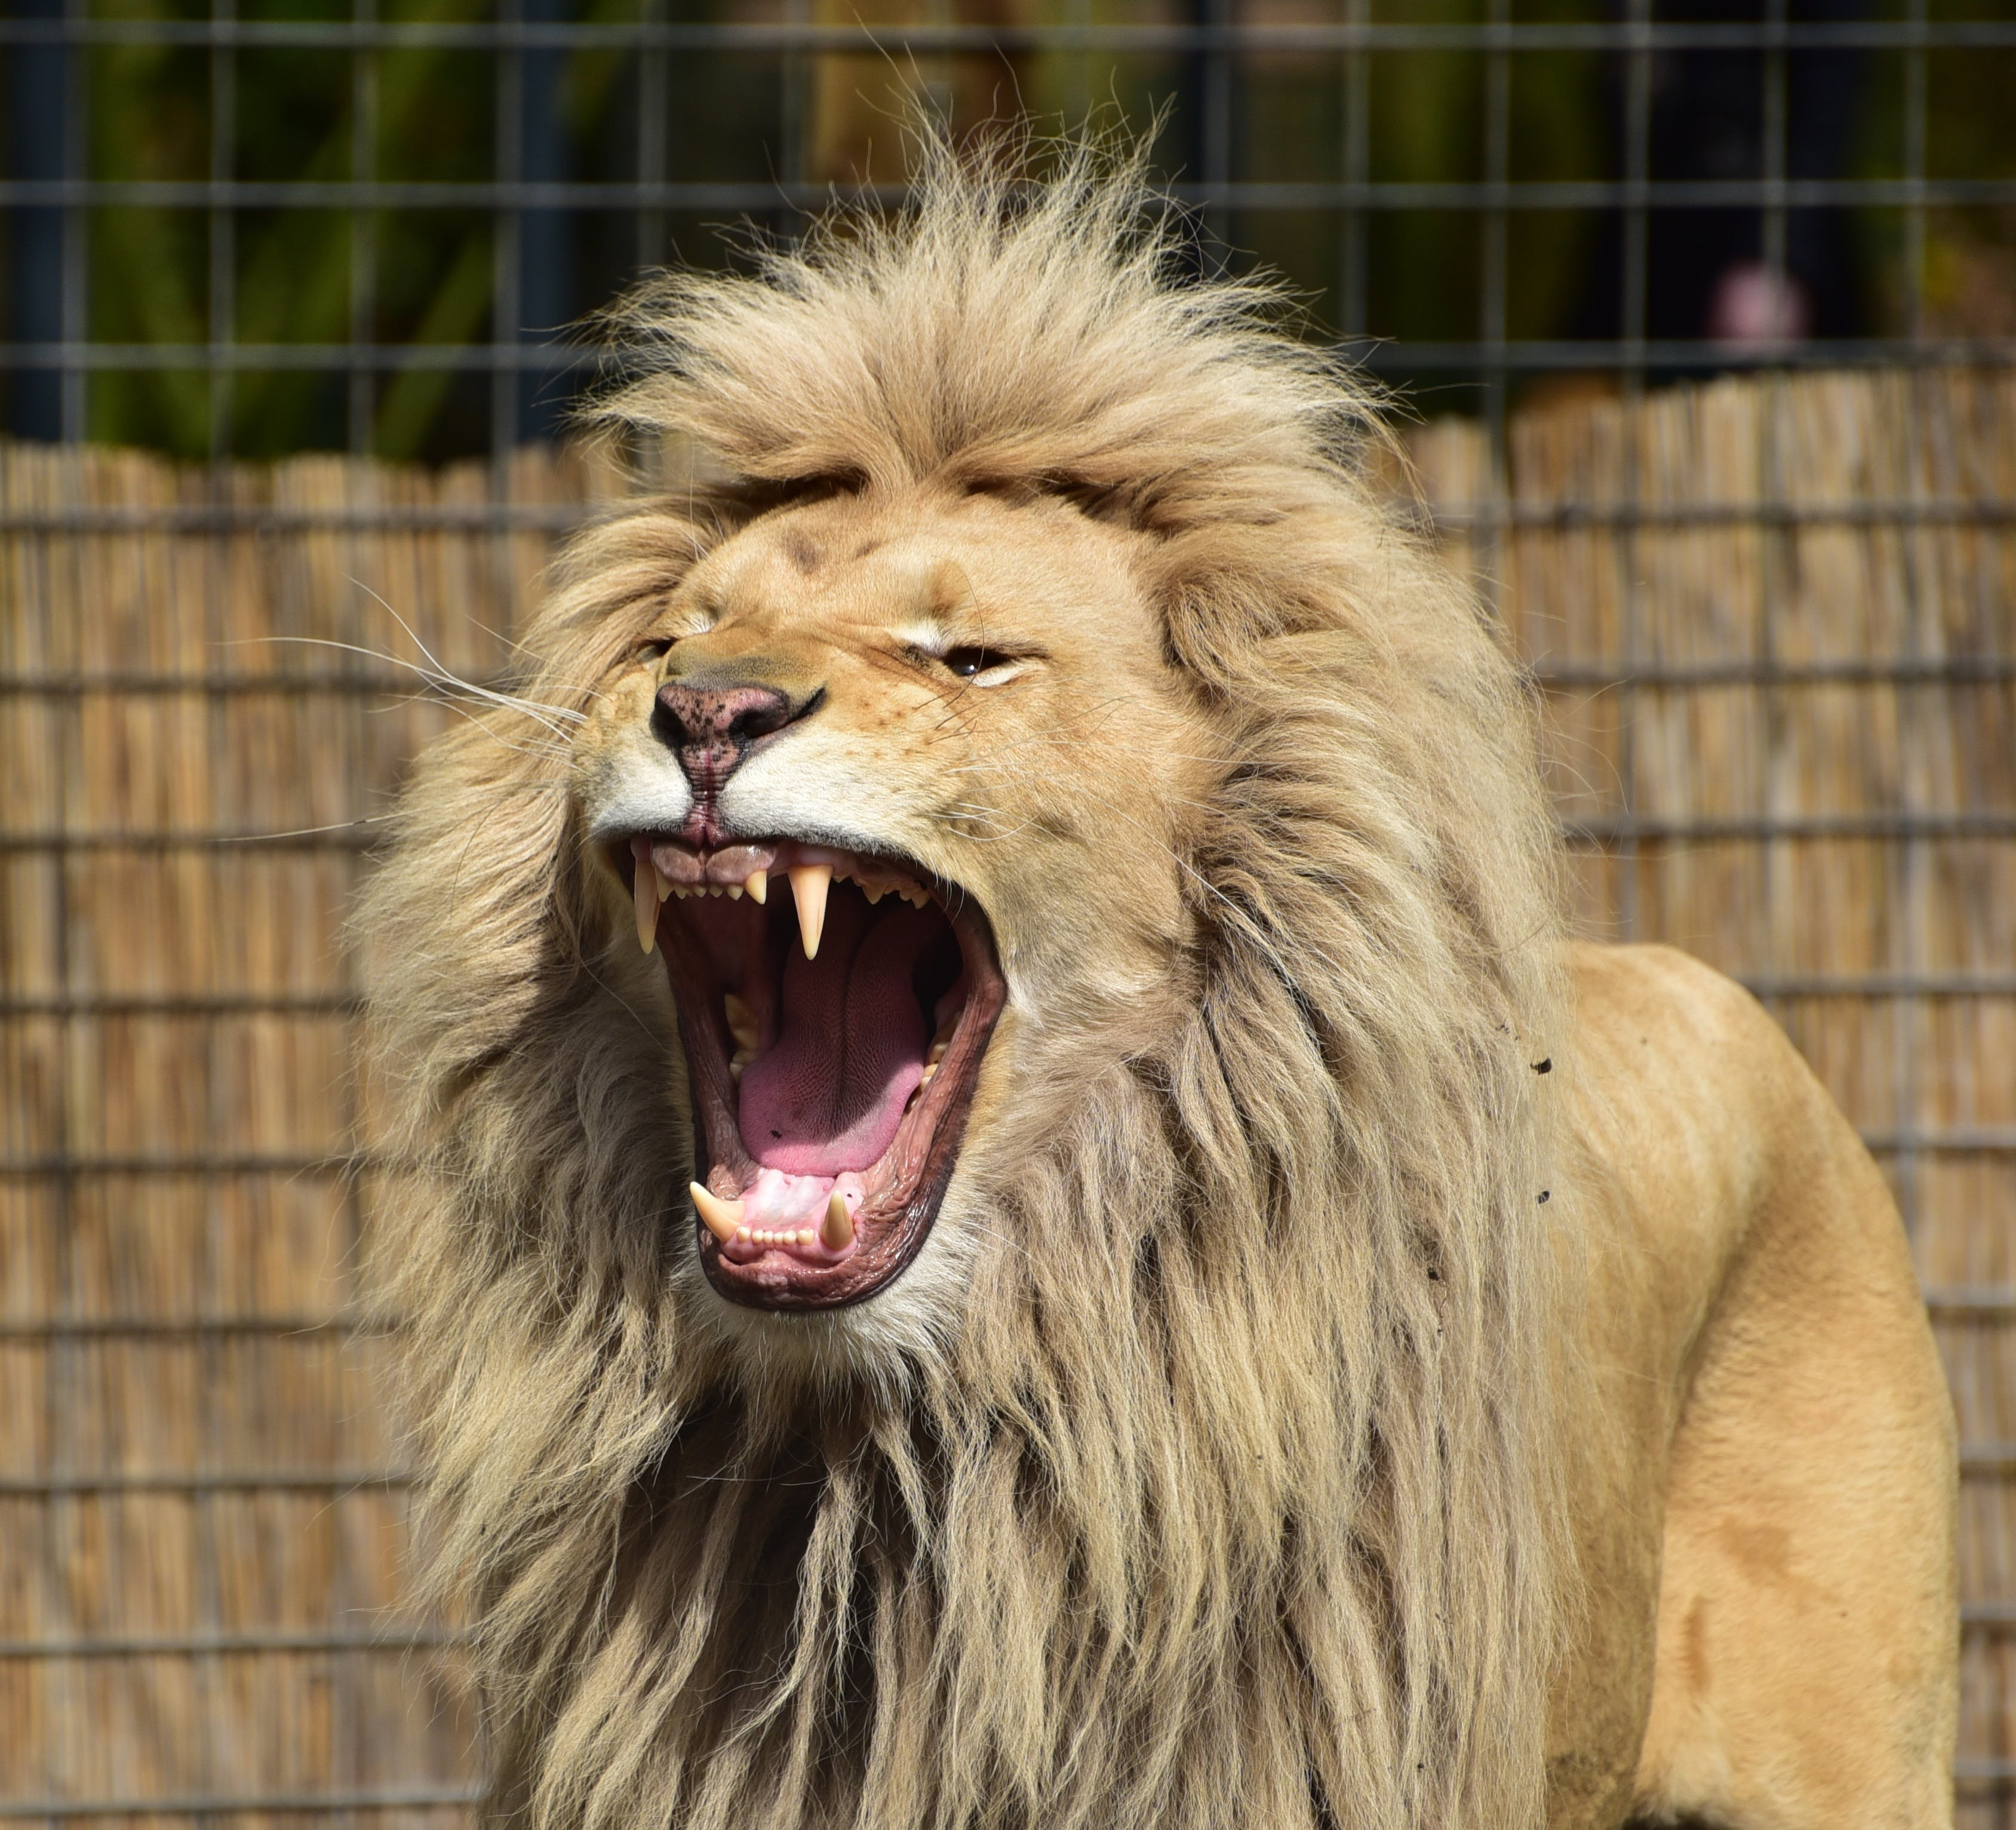 Lion Roaring Inside Cager